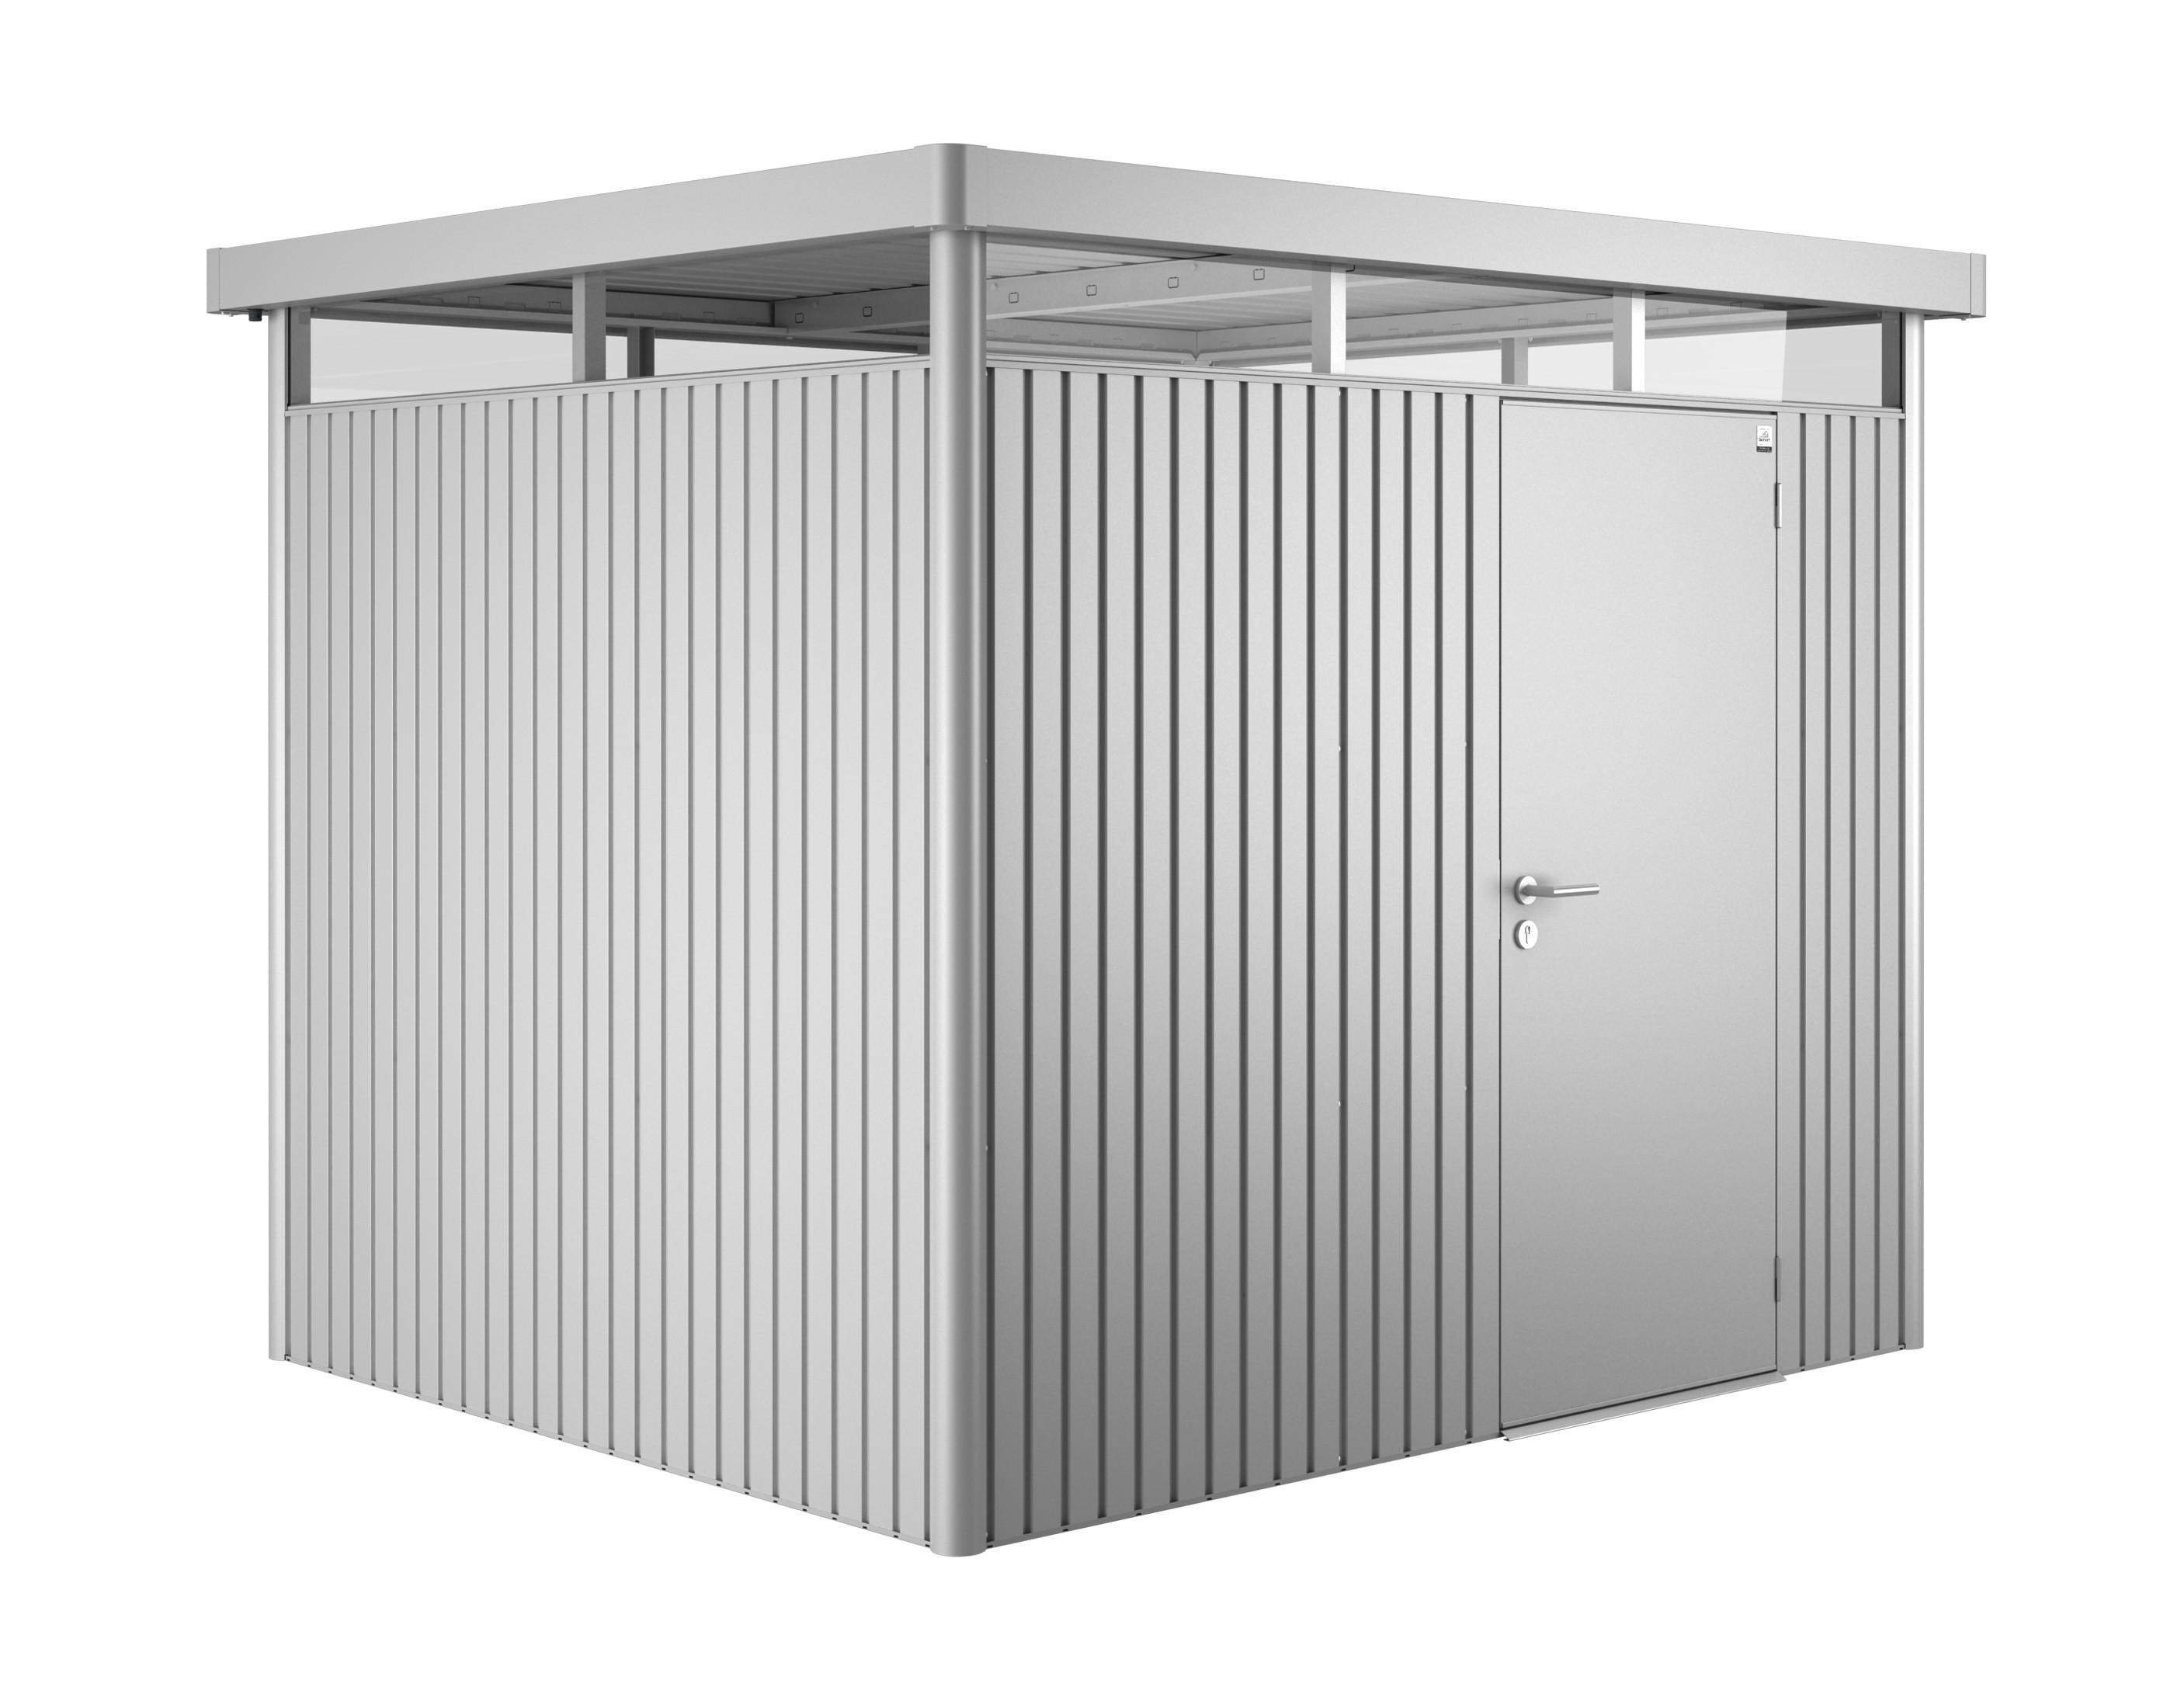 ger tehaus biohort highline h3 silber metallic 275x235x222cm bei. Black Bedroom Furniture Sets. Home Design Ideas